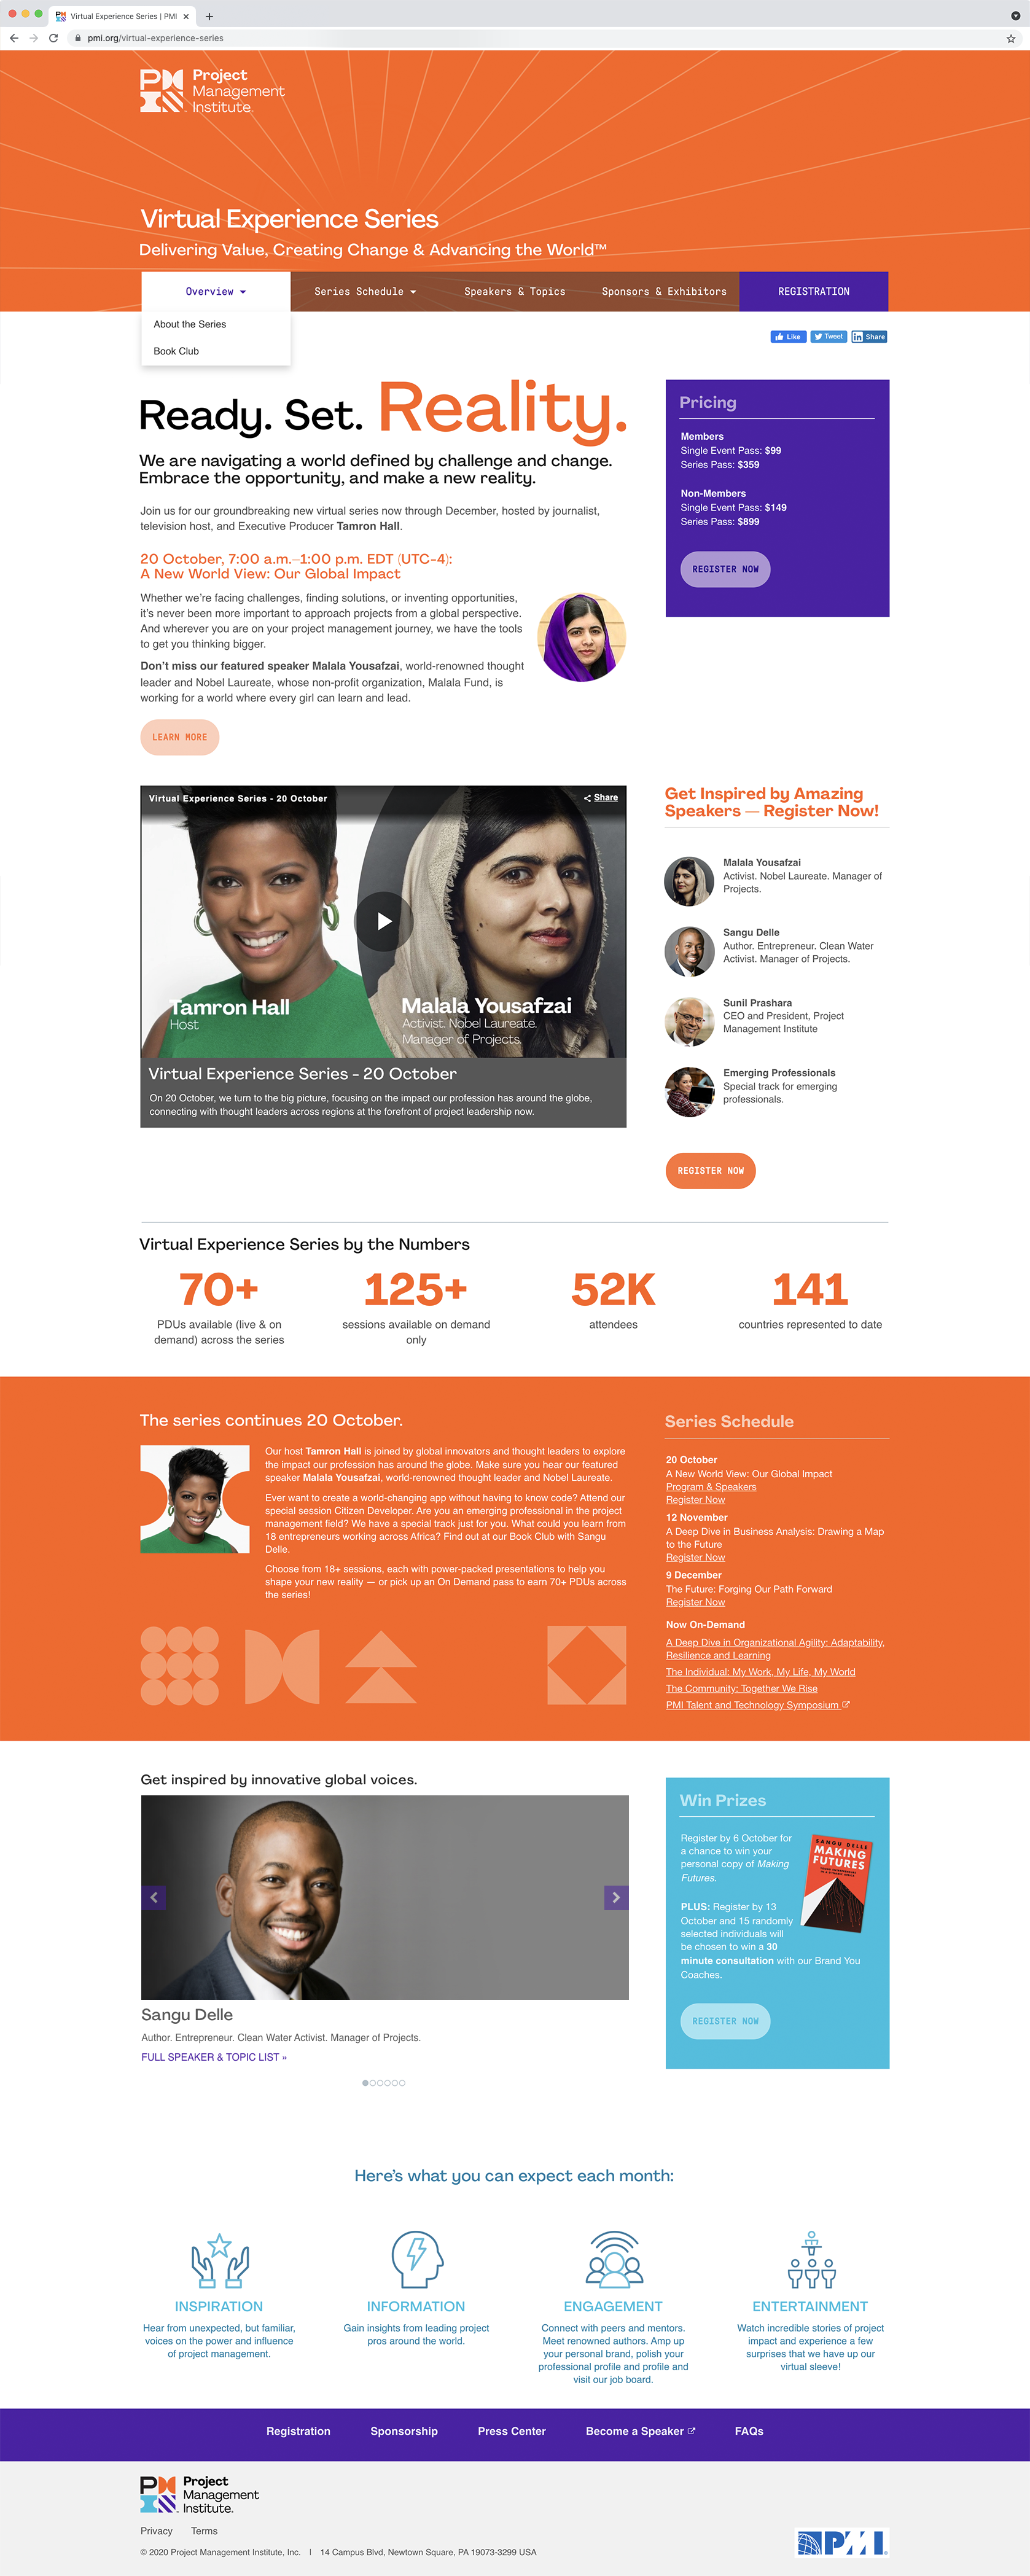 PMI Virtual Experience Series Homepage